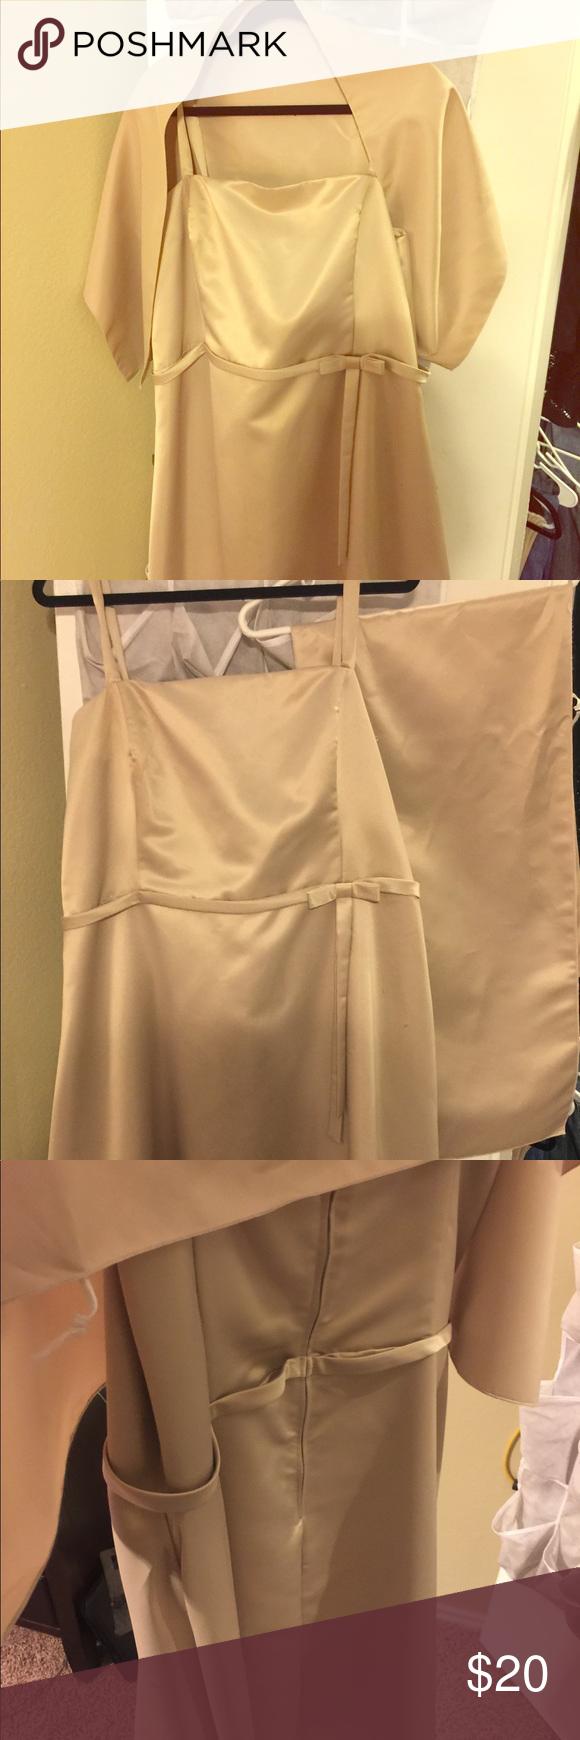 e16527672192 Tan Semi Formal dress with Shaw Tan Knee length dress beautiful for Special  evening. Smoke free